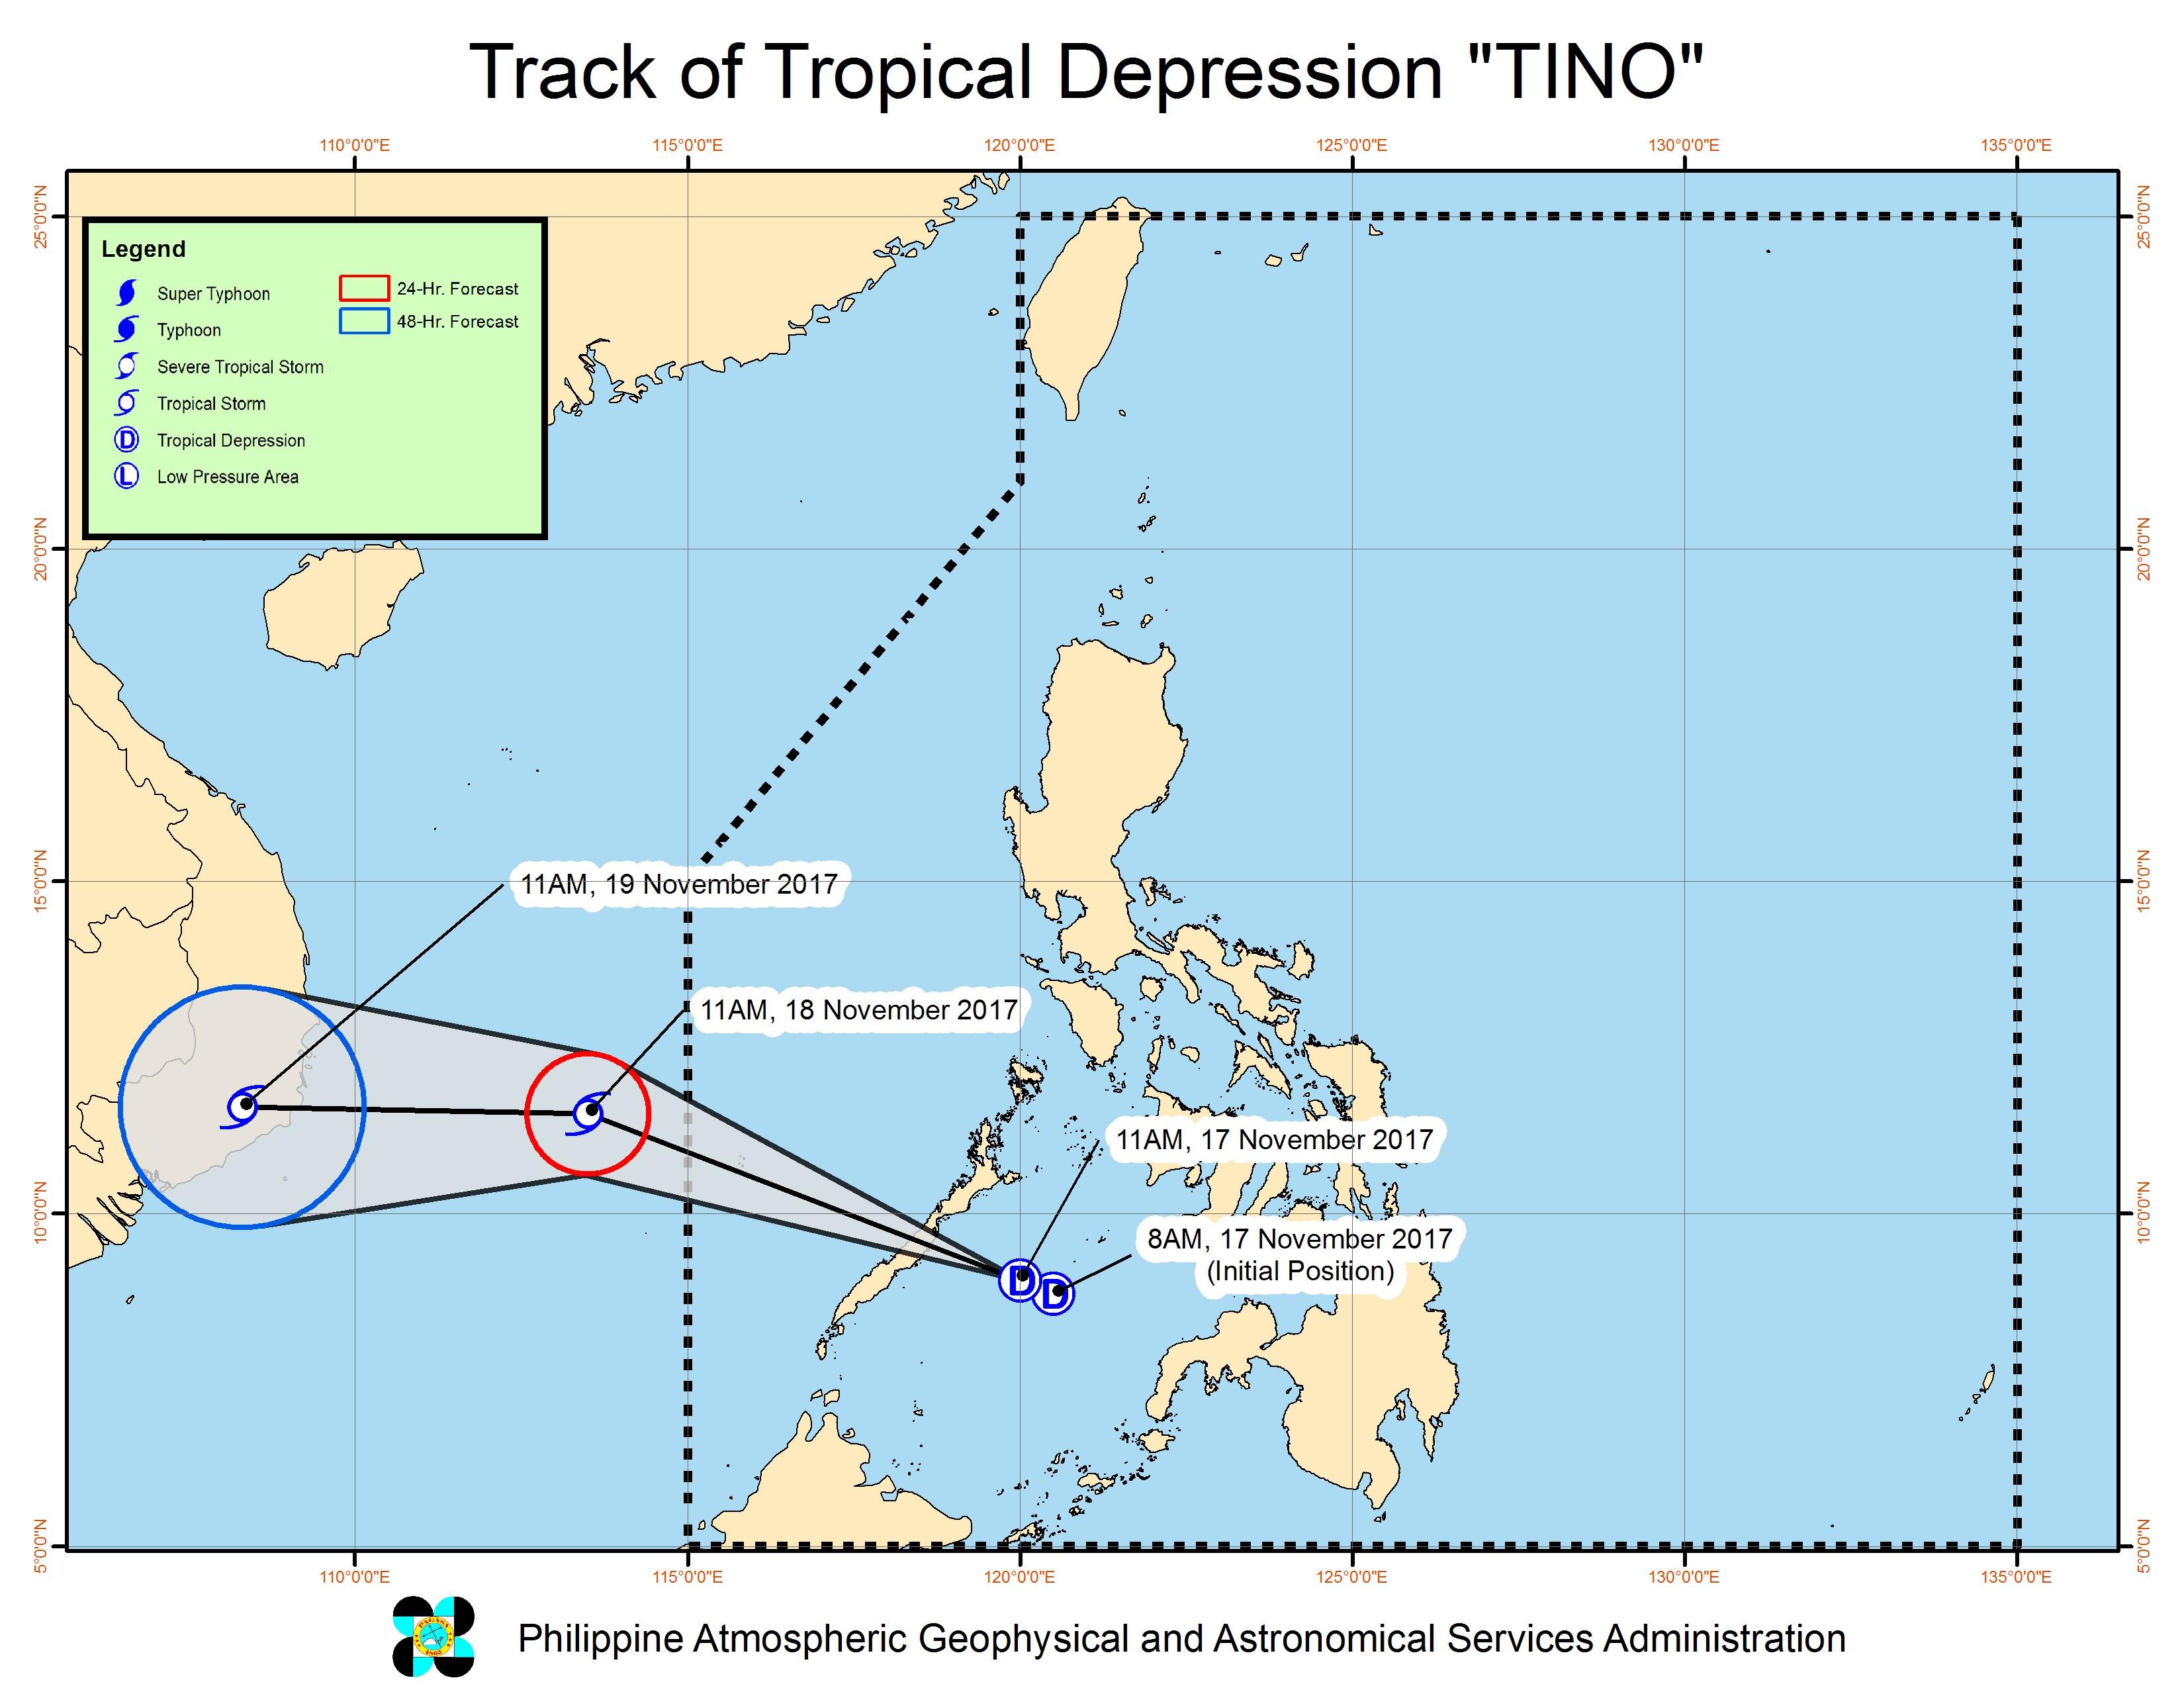 Forecast track of Tropical Depression Tino as of November 17, 2 pm. Image courtesy of PAGASA